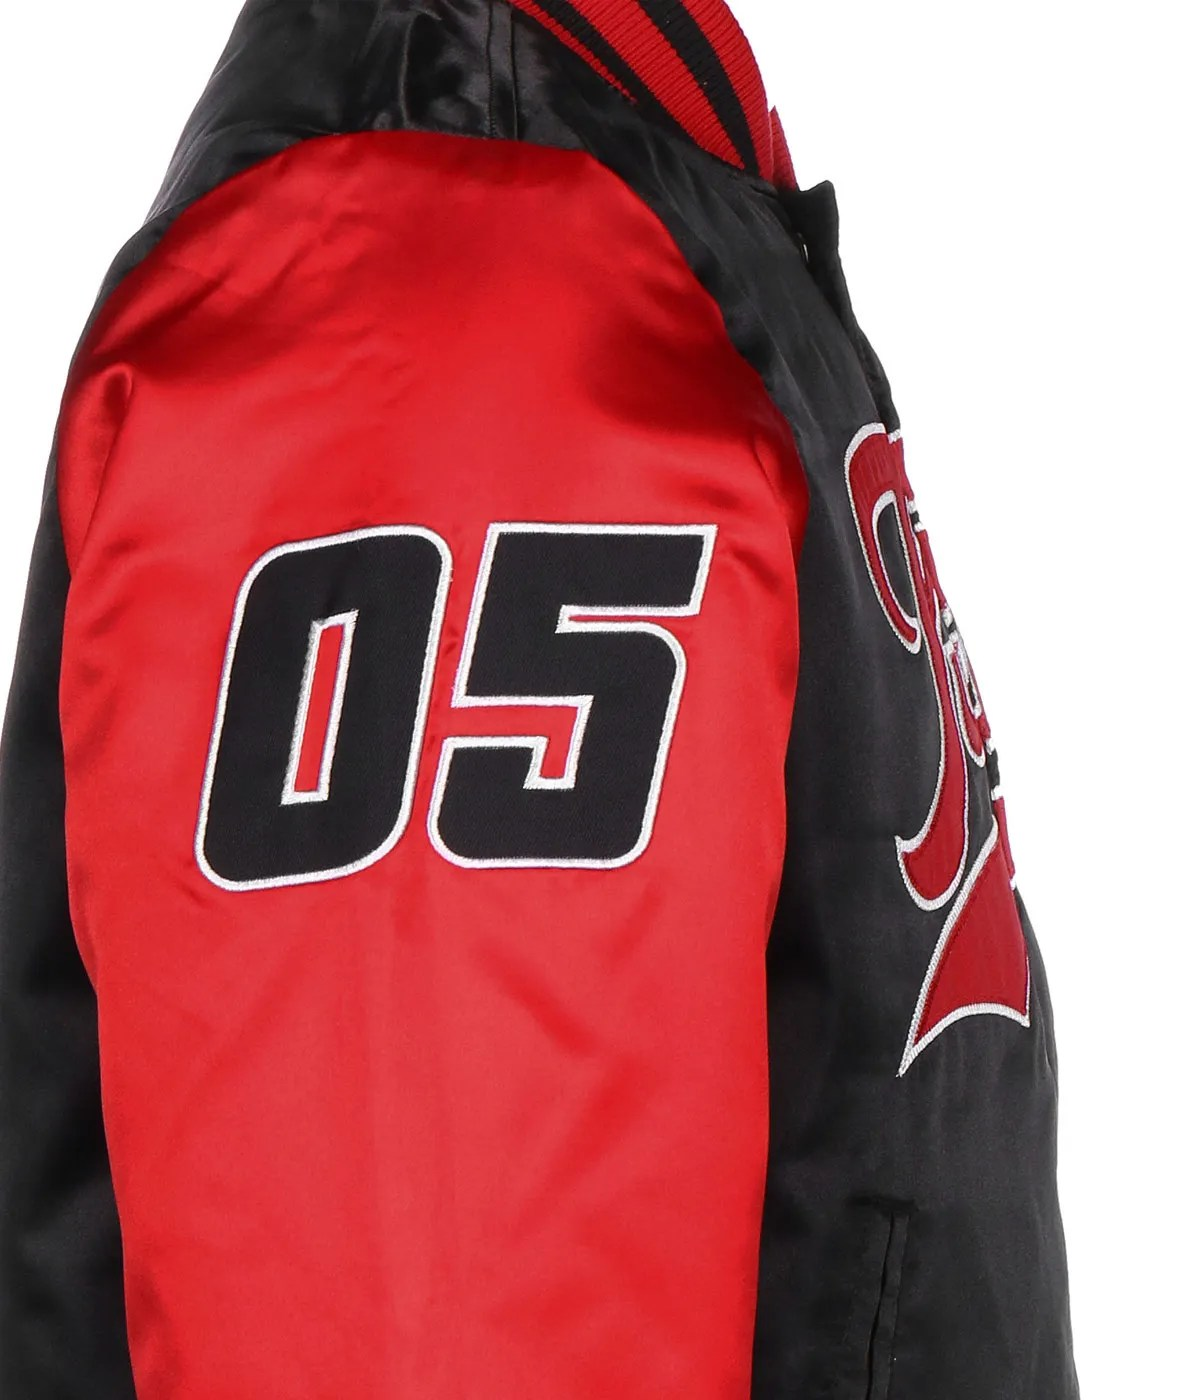 fubu-college-varsity-red-satin-jacket